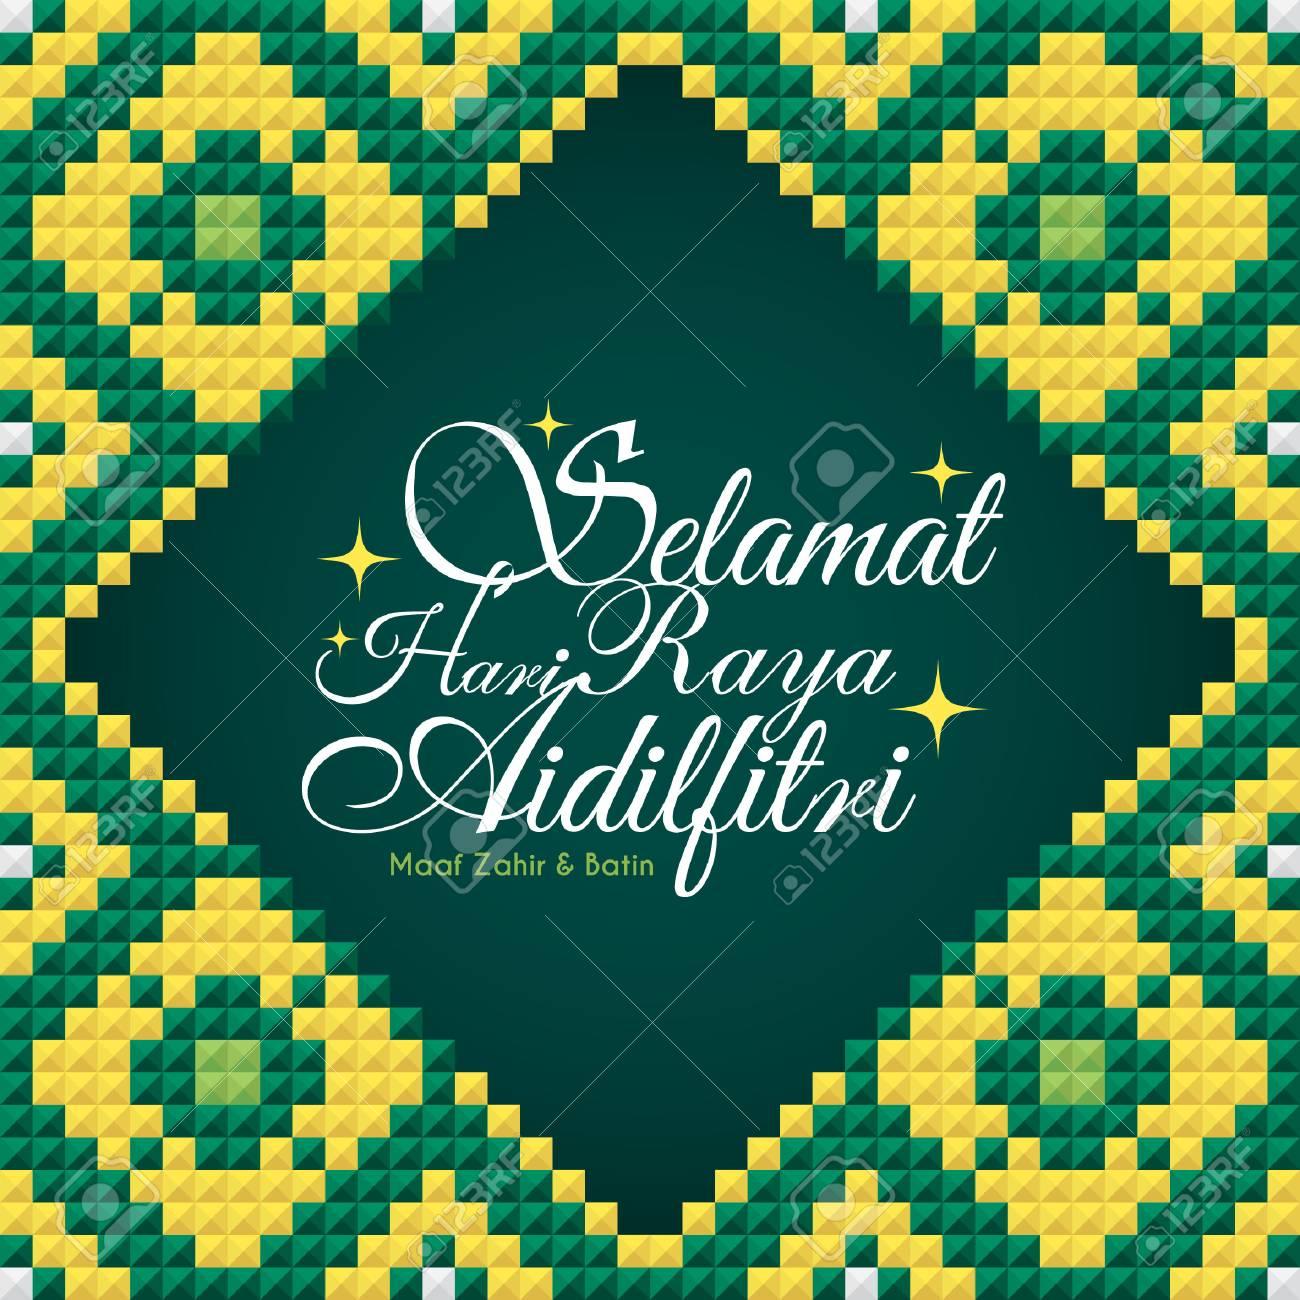 Selamat Hari Raya Aidilfitri Greeting Card Template With Islamic Royalty Free Cliparts Vectors And Stock Illustration Image 101863308